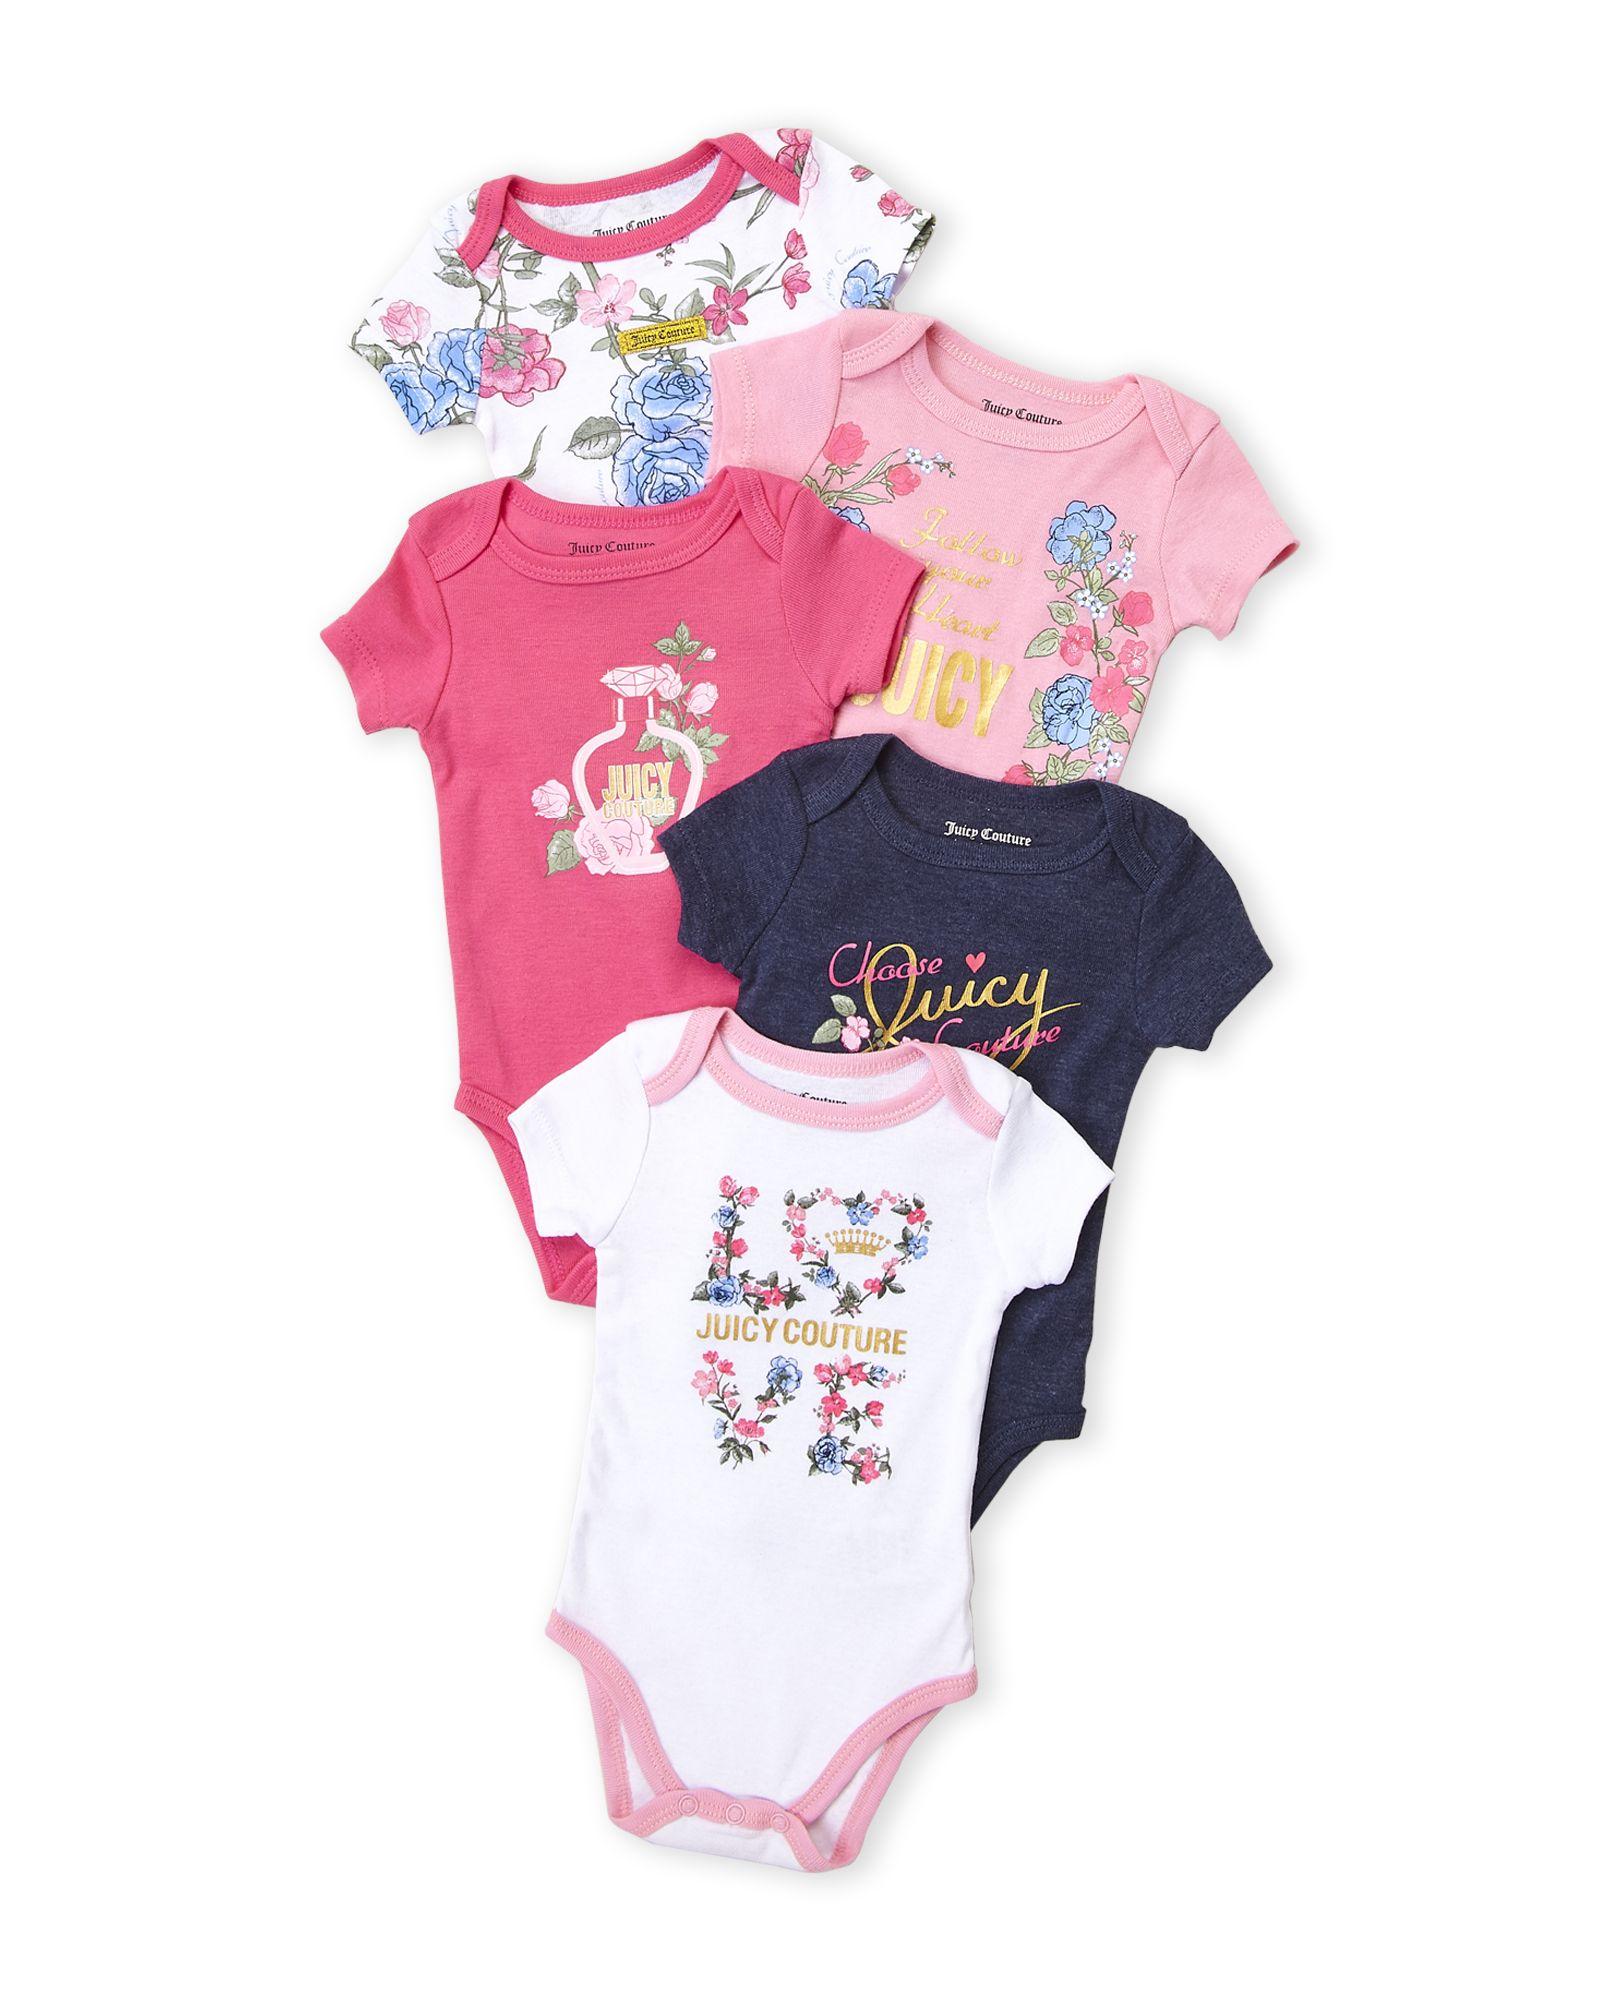 e63ef2e96 Juicy Couture (Newborn Girls) 5-Pack Floral Bodysuit Set | *Apparel ...